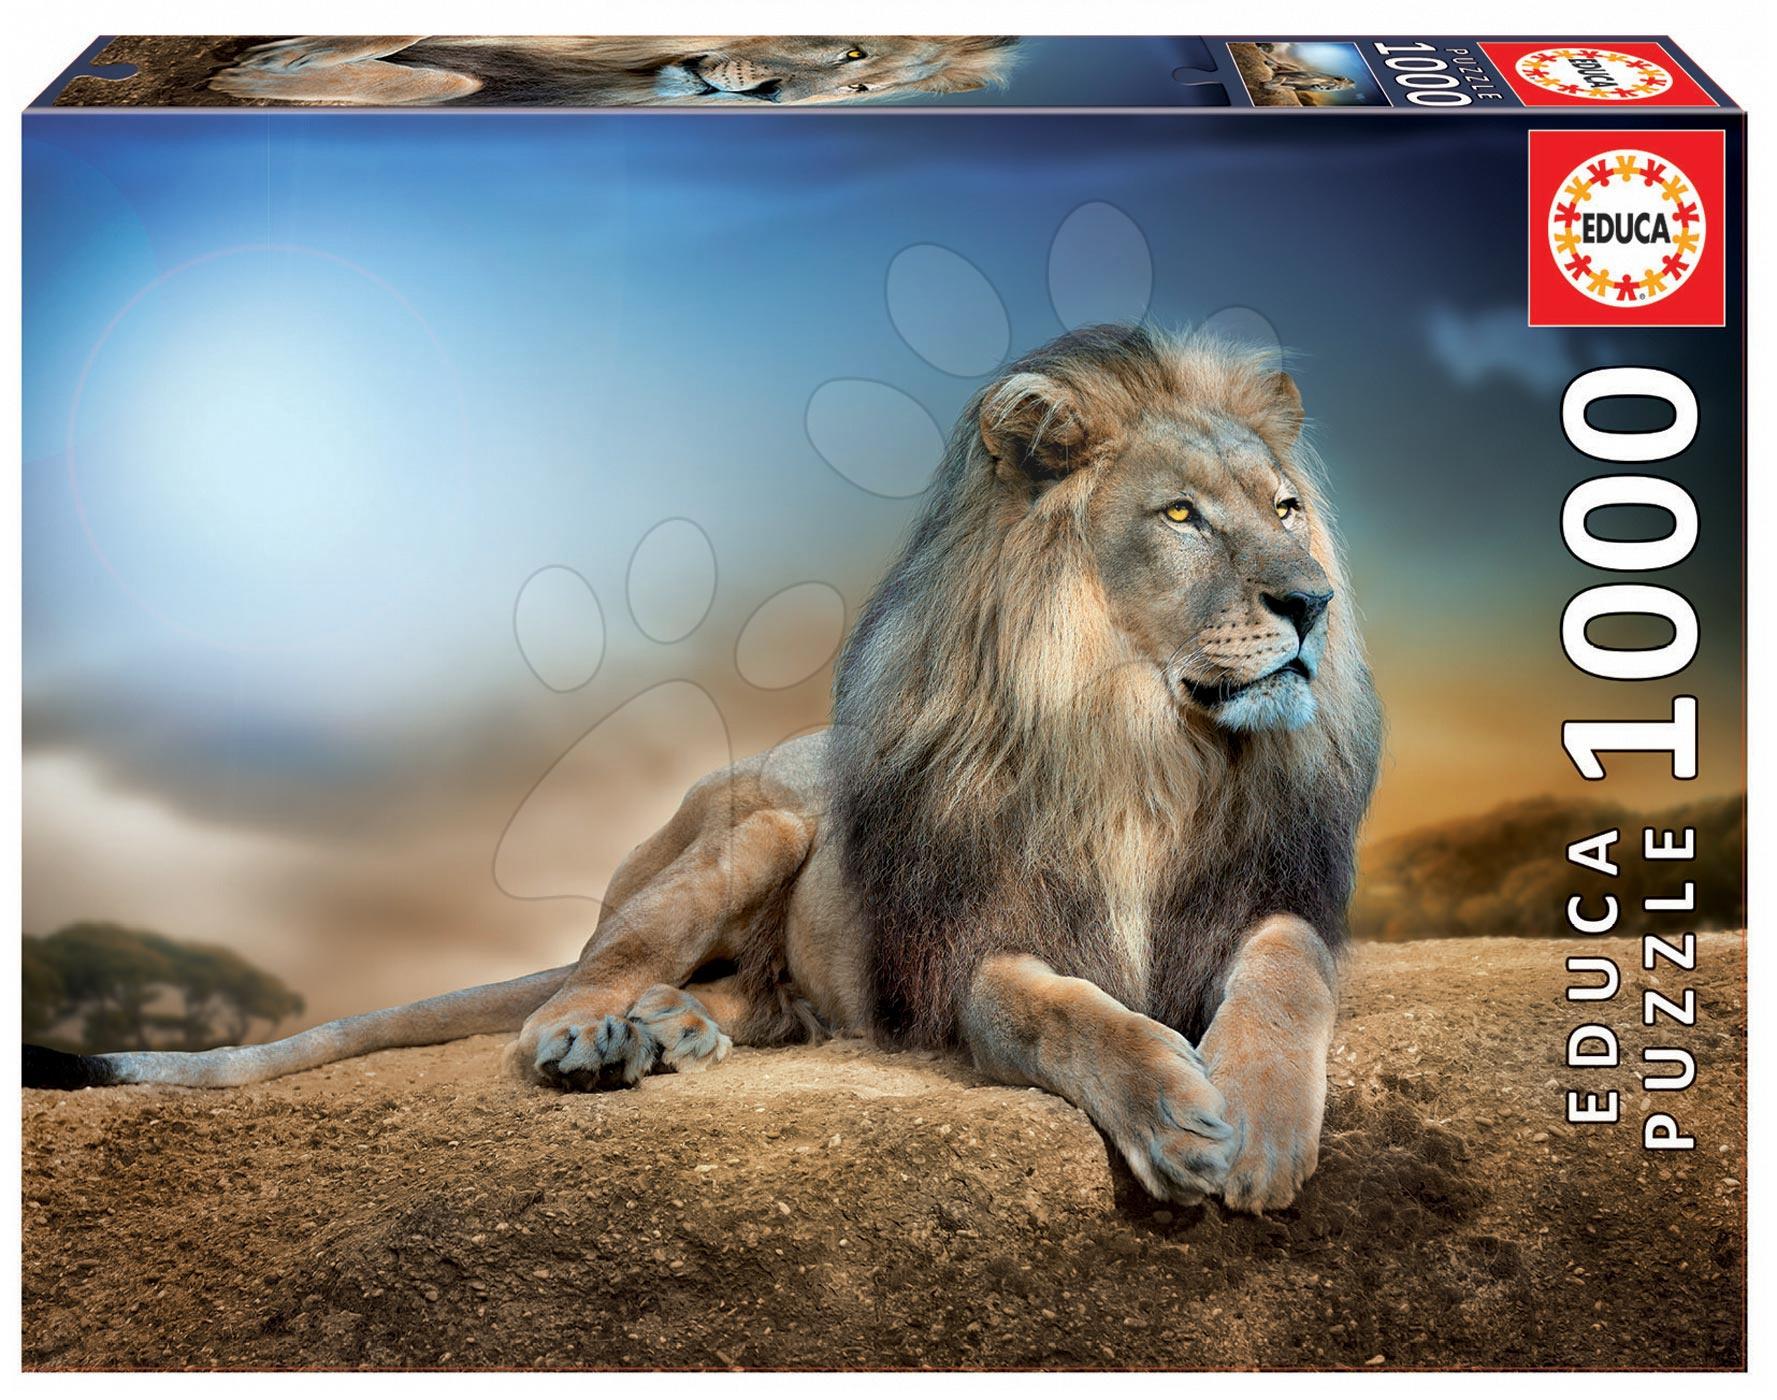 Puzzle 1000 dielne - Puzzle Genuine His Majesty Educa 1000 dielov od 12 rokov